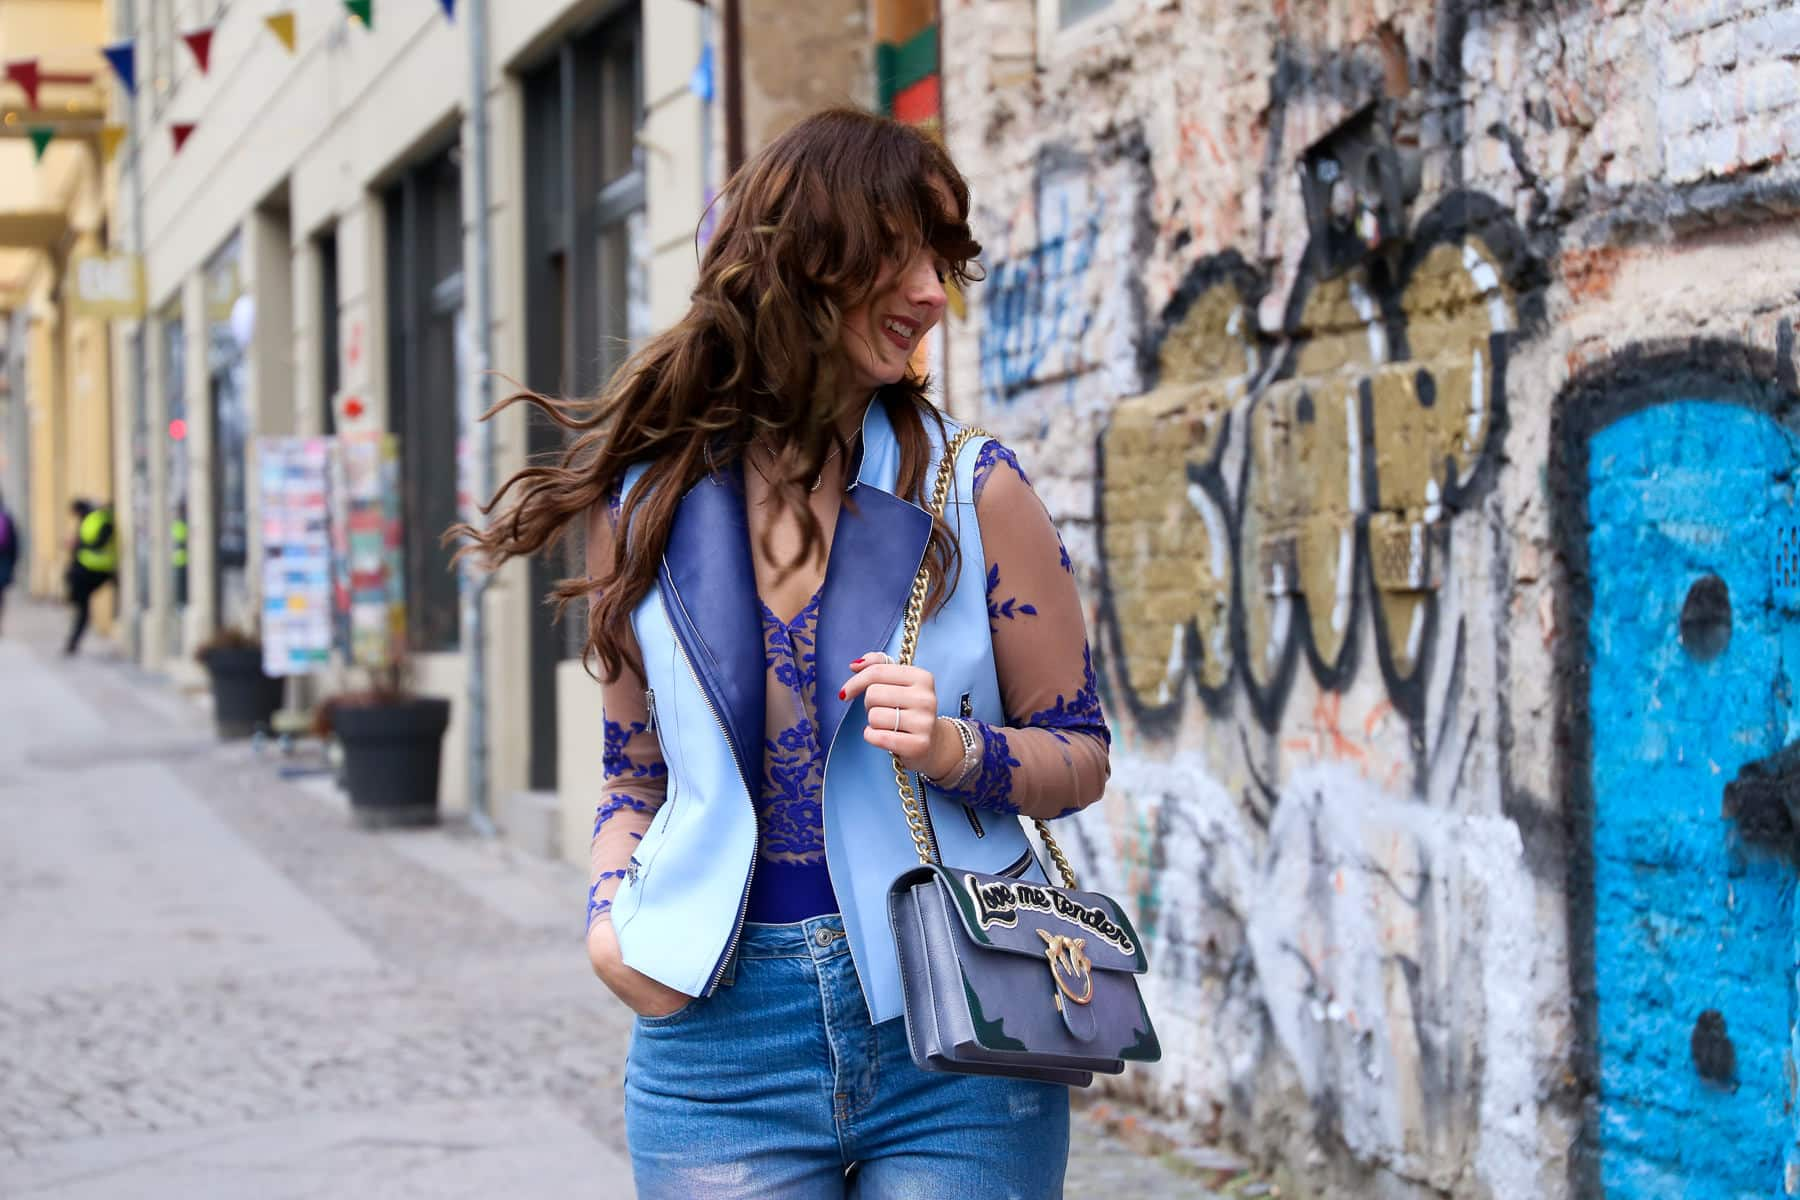 Outfit in Berlin - Holo Trend Jeans & transparenter Body à la Kardashian